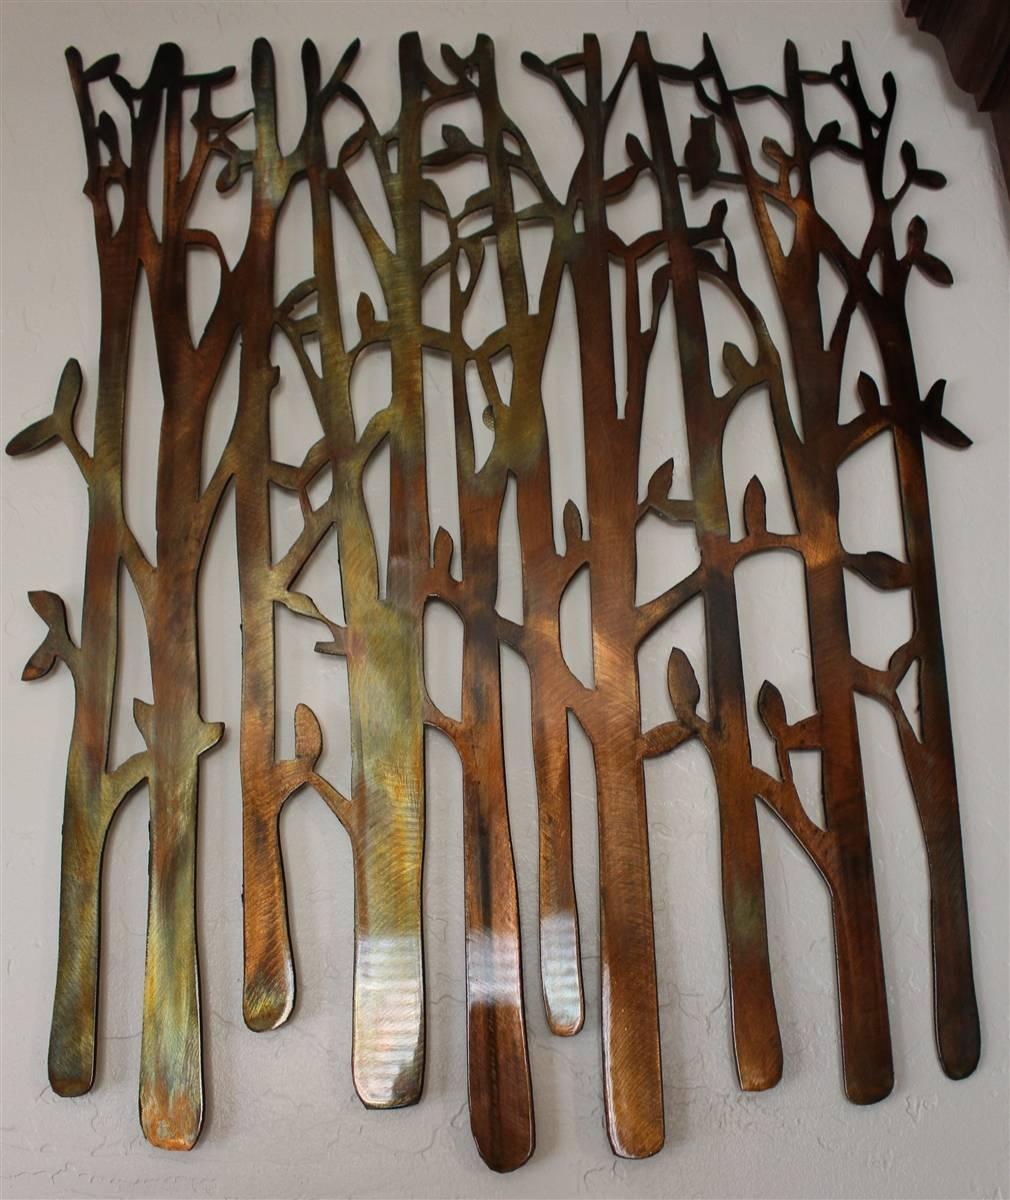 Birch Tree, Birch Tree Metal Art, Bamboo, Bird In The Trees, Bird For Most Popular Metallic Wall Art (View 8 of 25)